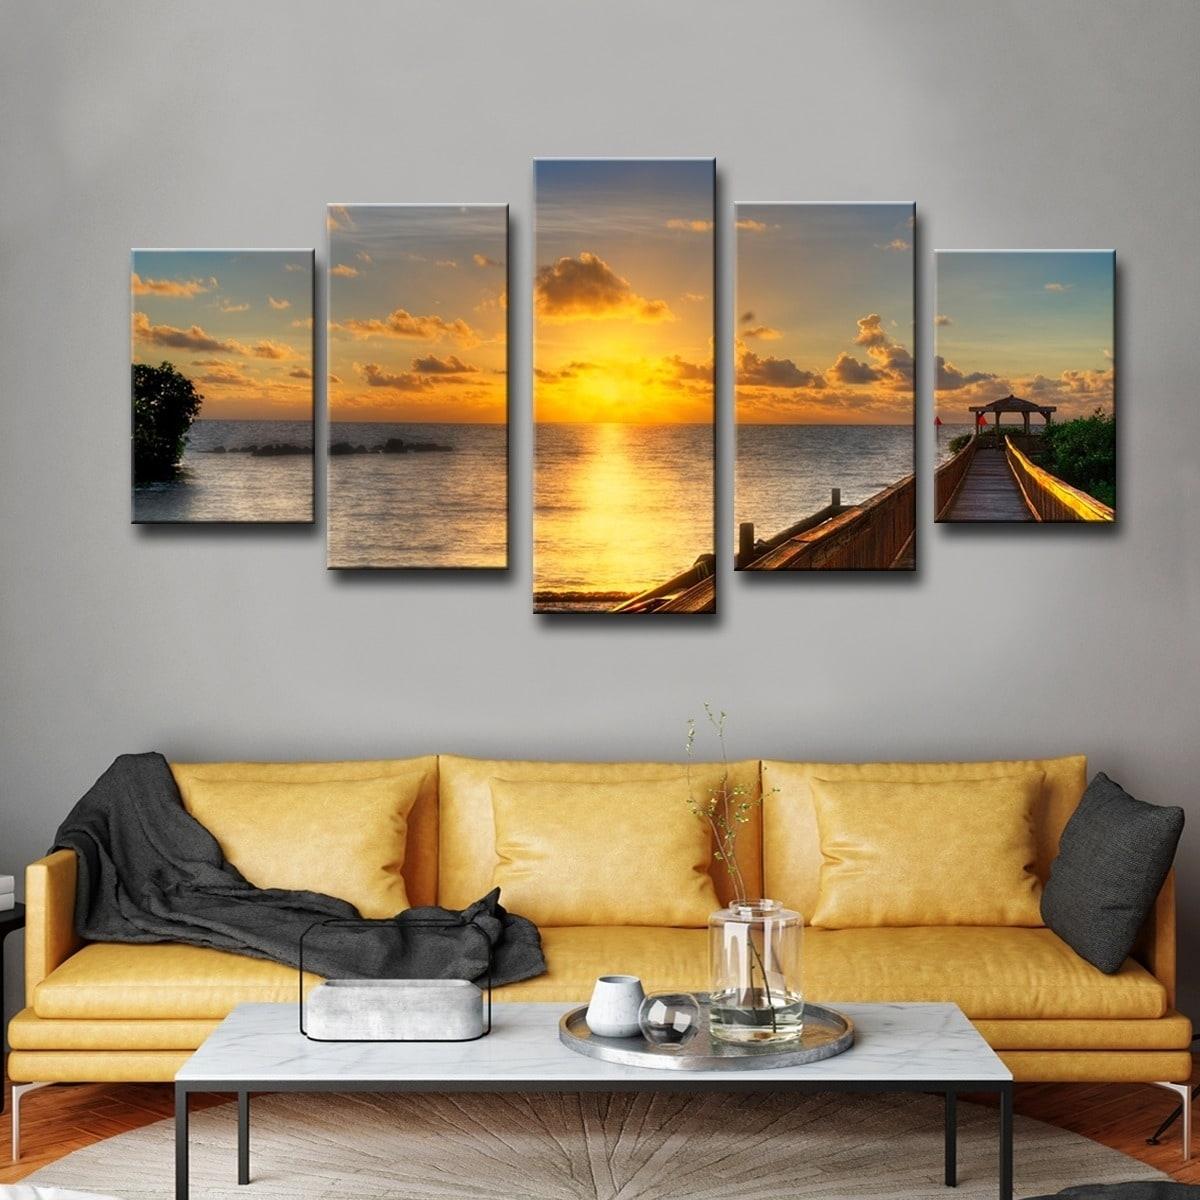 Shop Havenside Home Key's Sunrise' 5-Piece Set Canvas Wall Art inside Overstock Wall Art (Image 10 of 20)